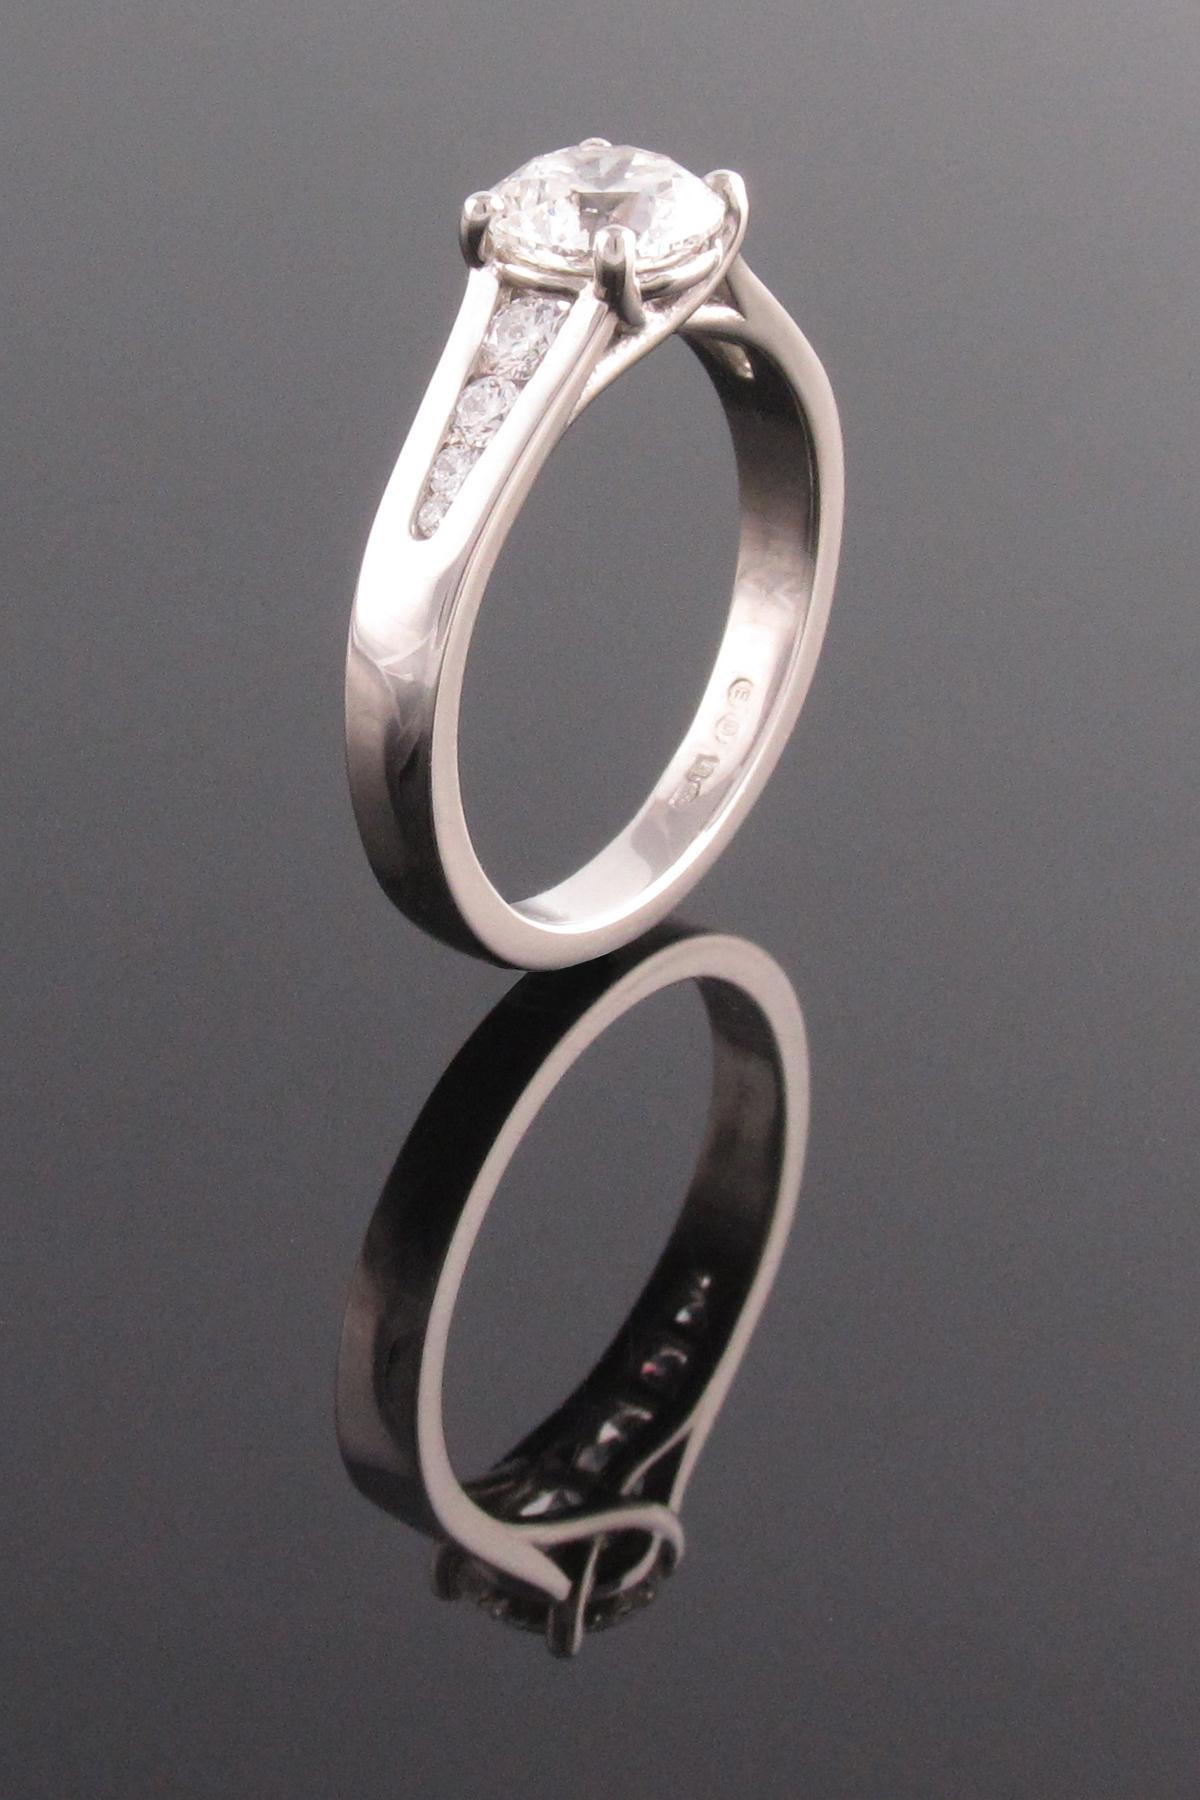 Platinum 4 claw diamond solitaire engagement ring